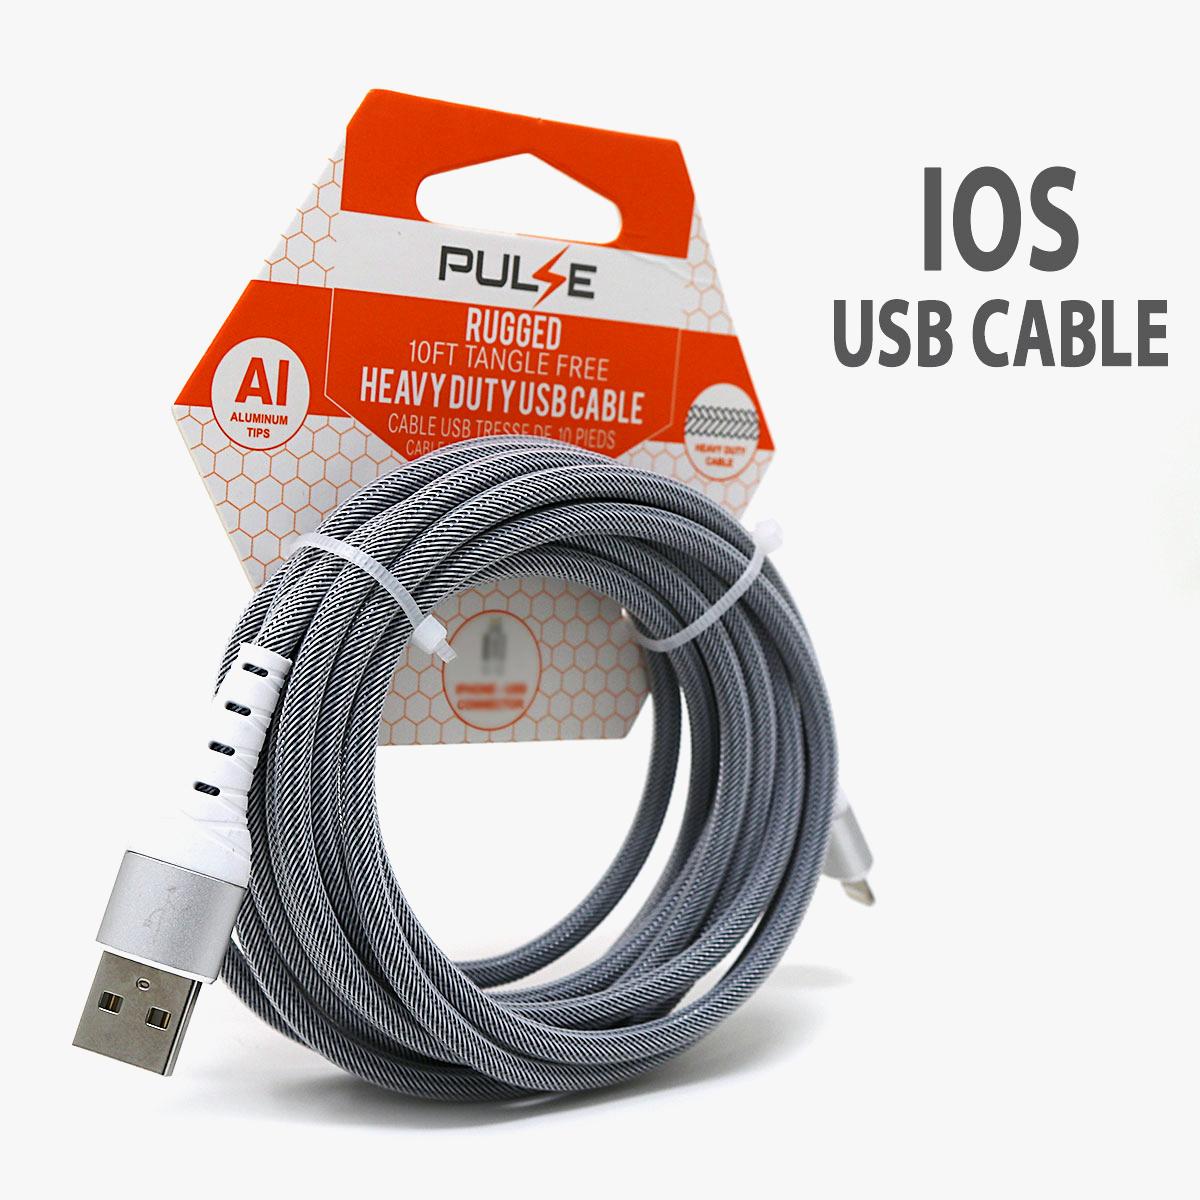 USB-10002-10FHD-IP-GY-WT